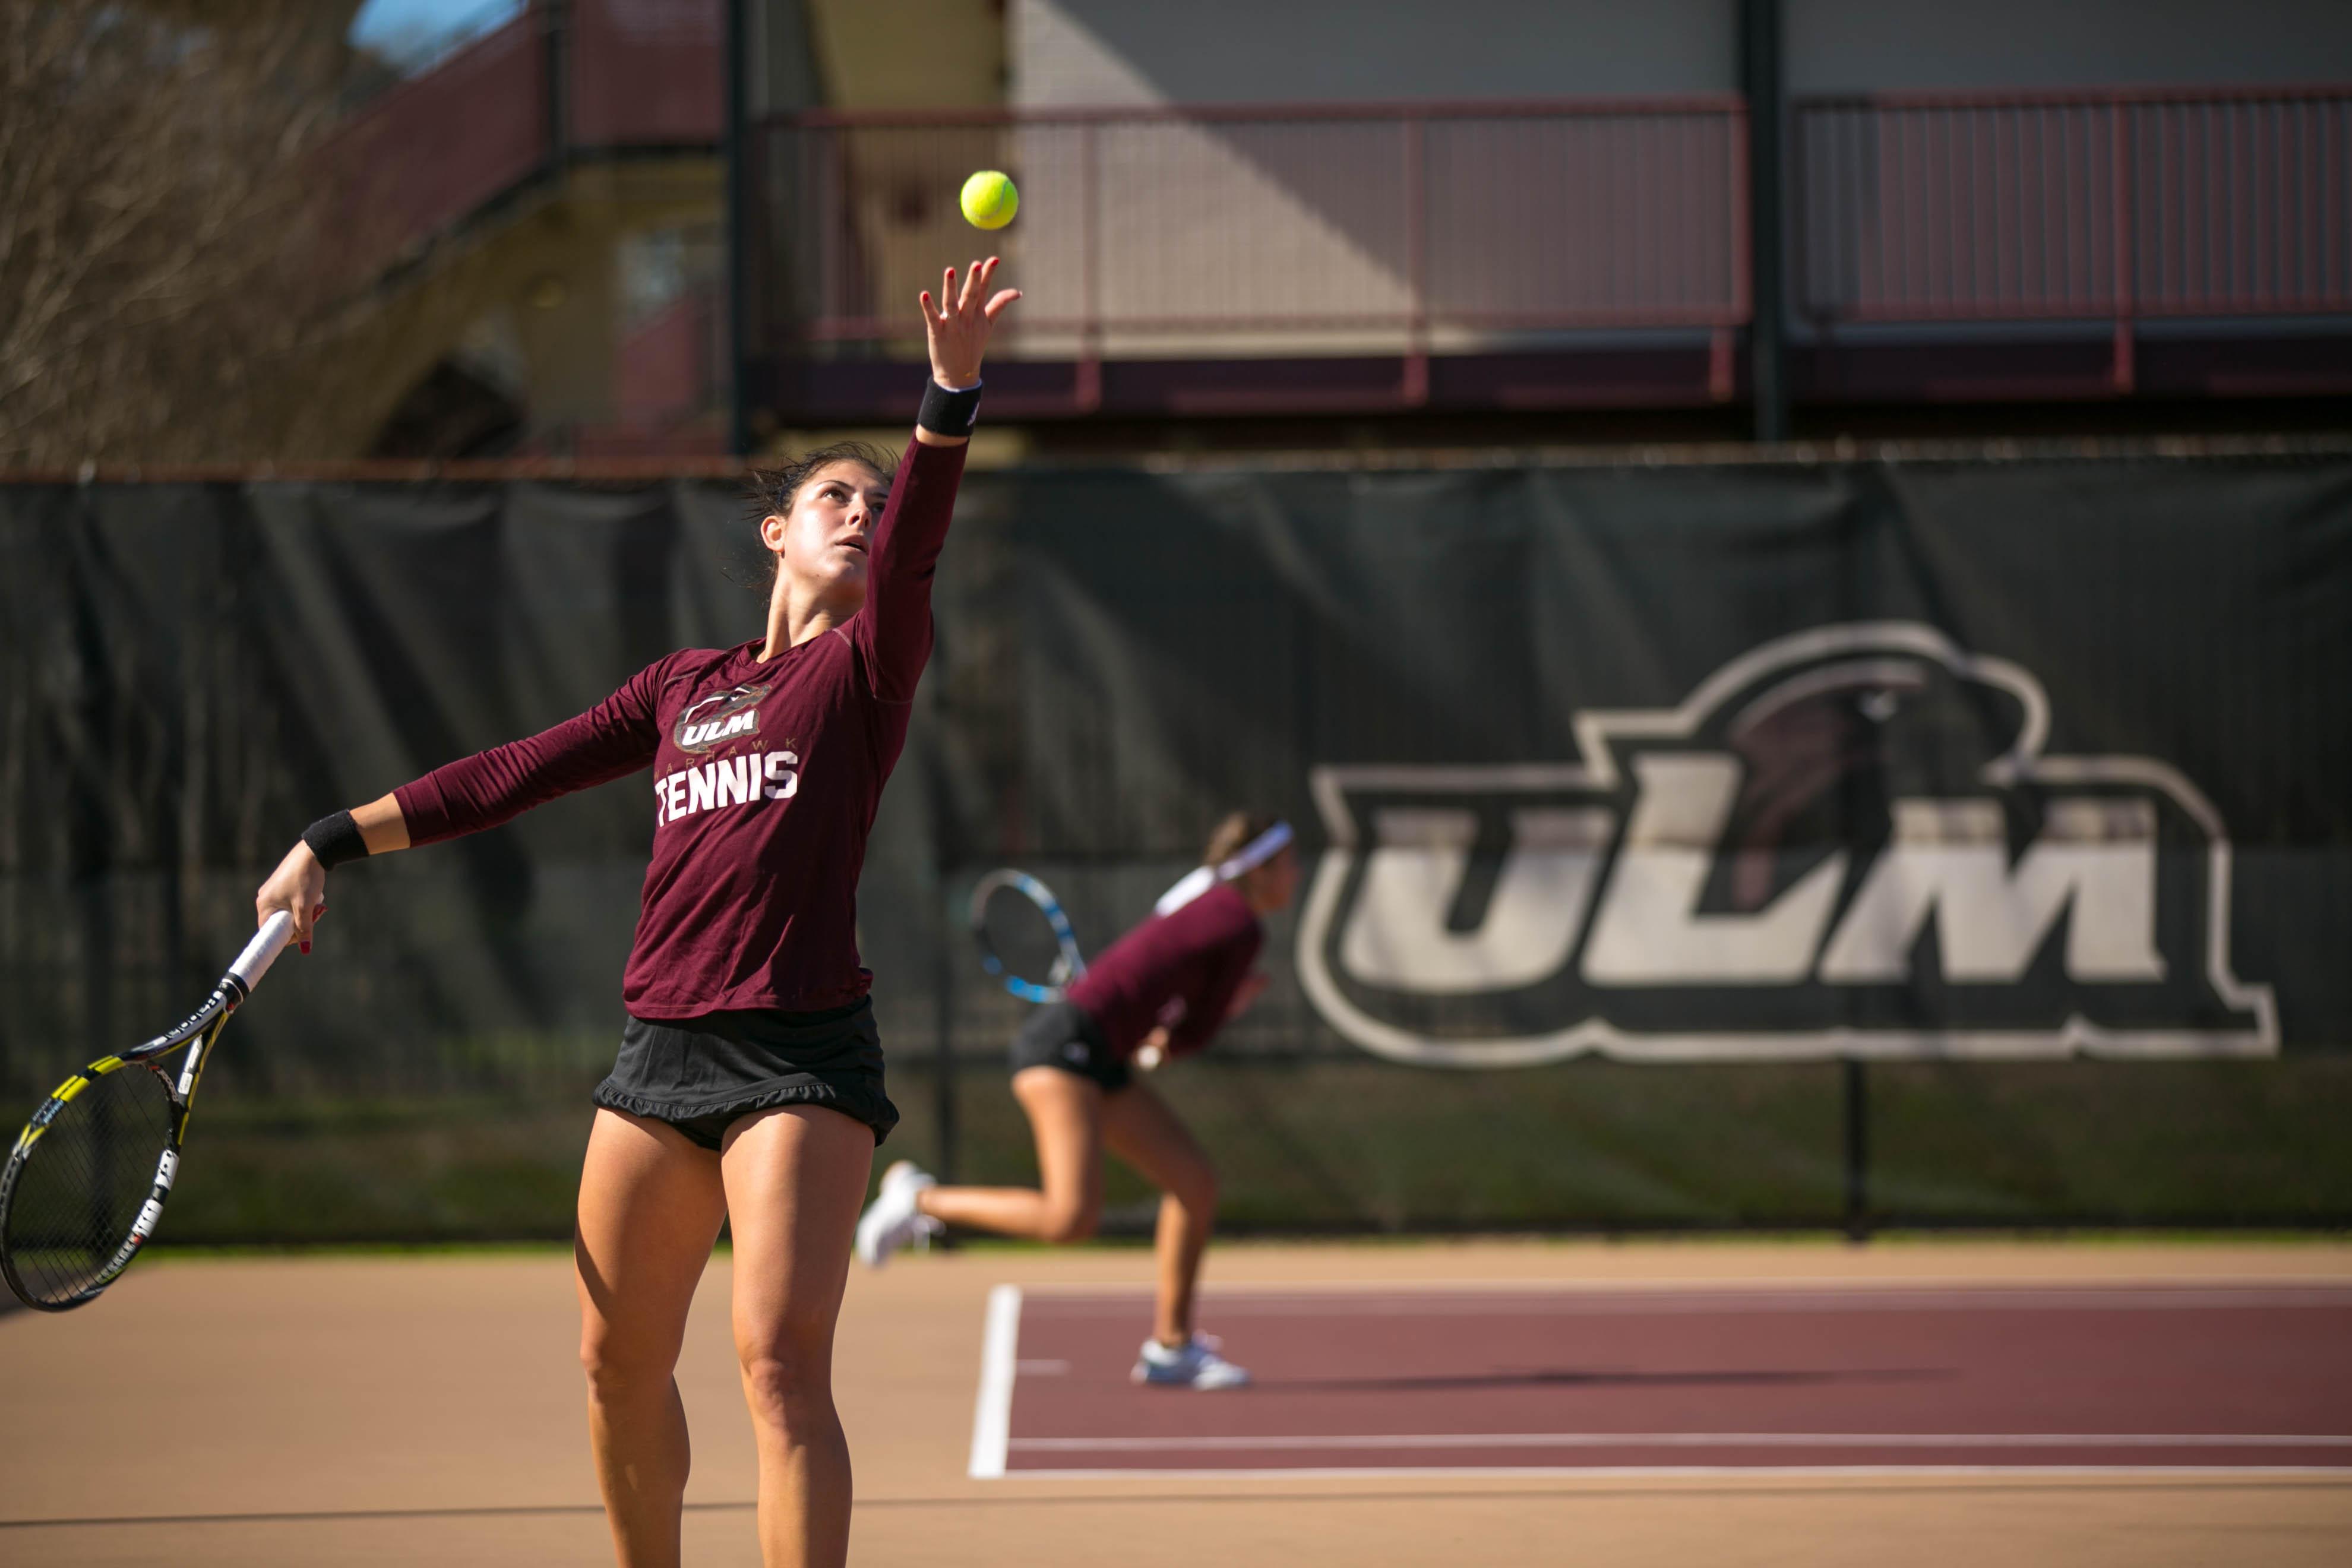 Ulm Tennis